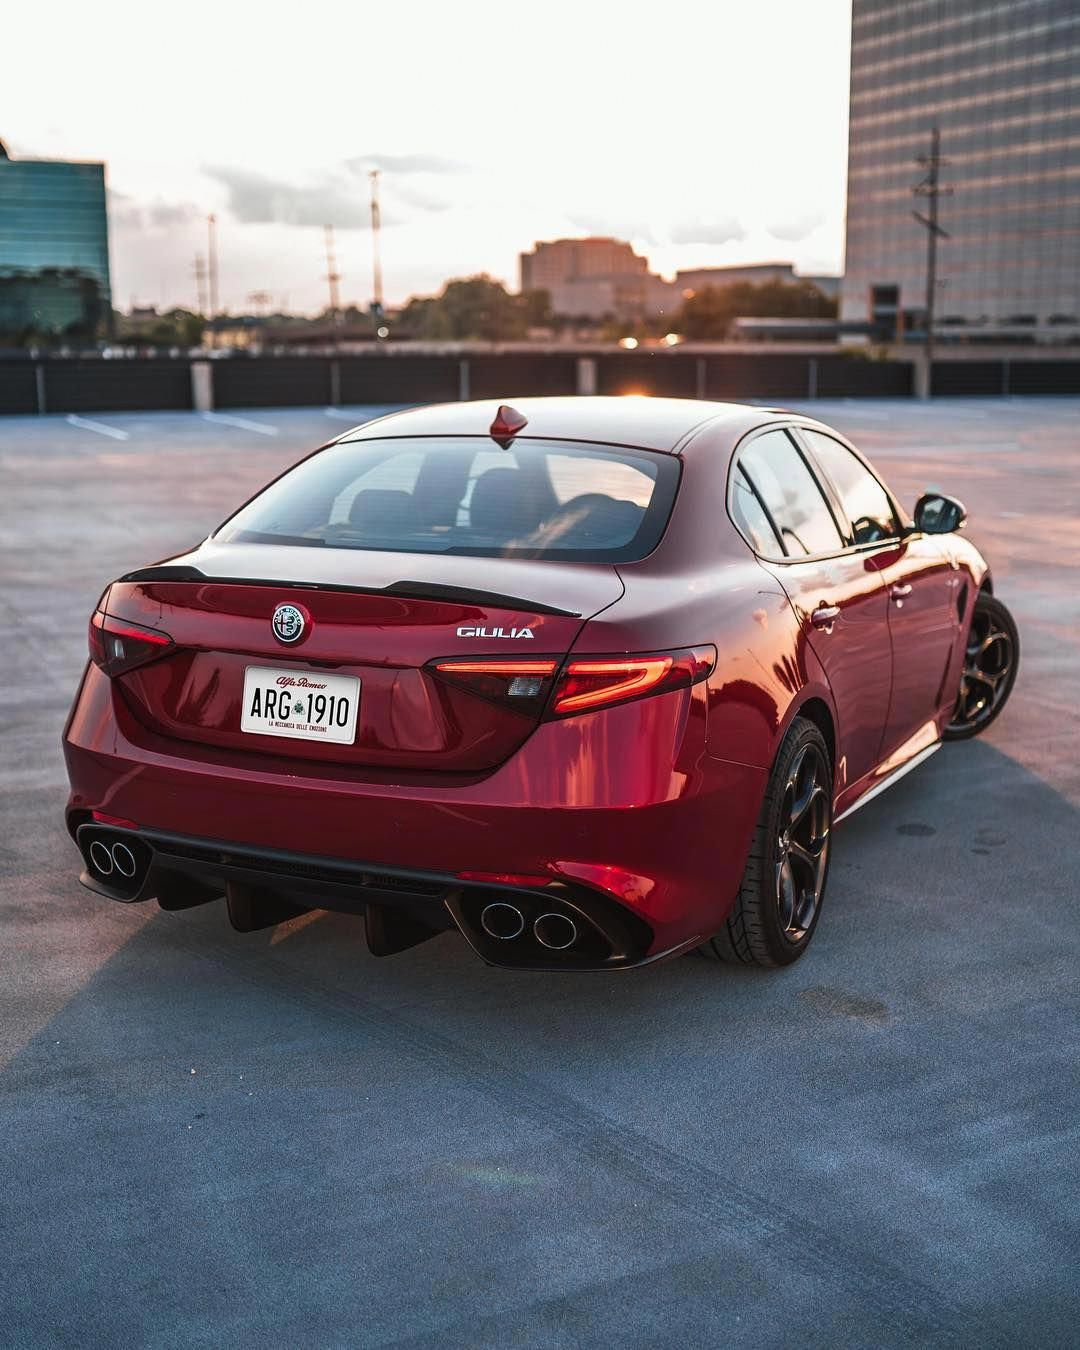 Alfa Romeo Giulia Quadrifoglio #FerrariPink